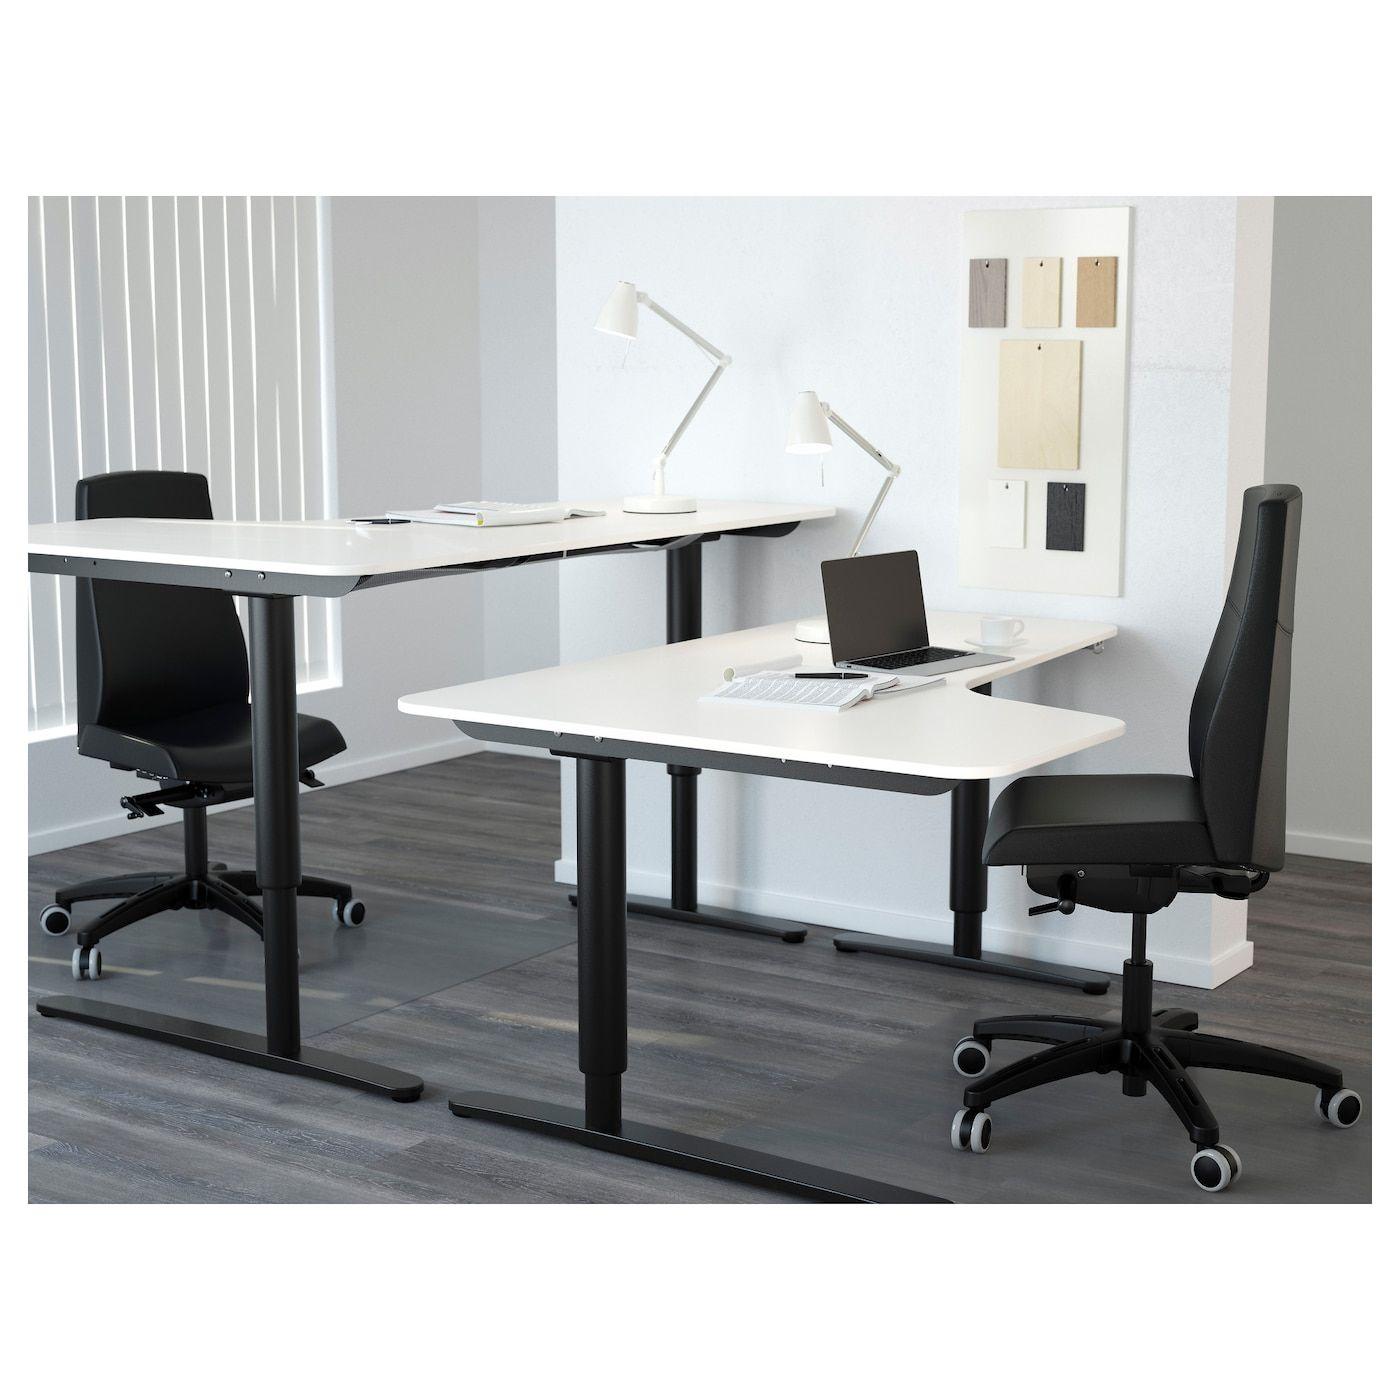 Bekant Ecktischplatte Links Weiss Ikea Osterreich In 2020 Ikea Bekant Home Home Office Furniture